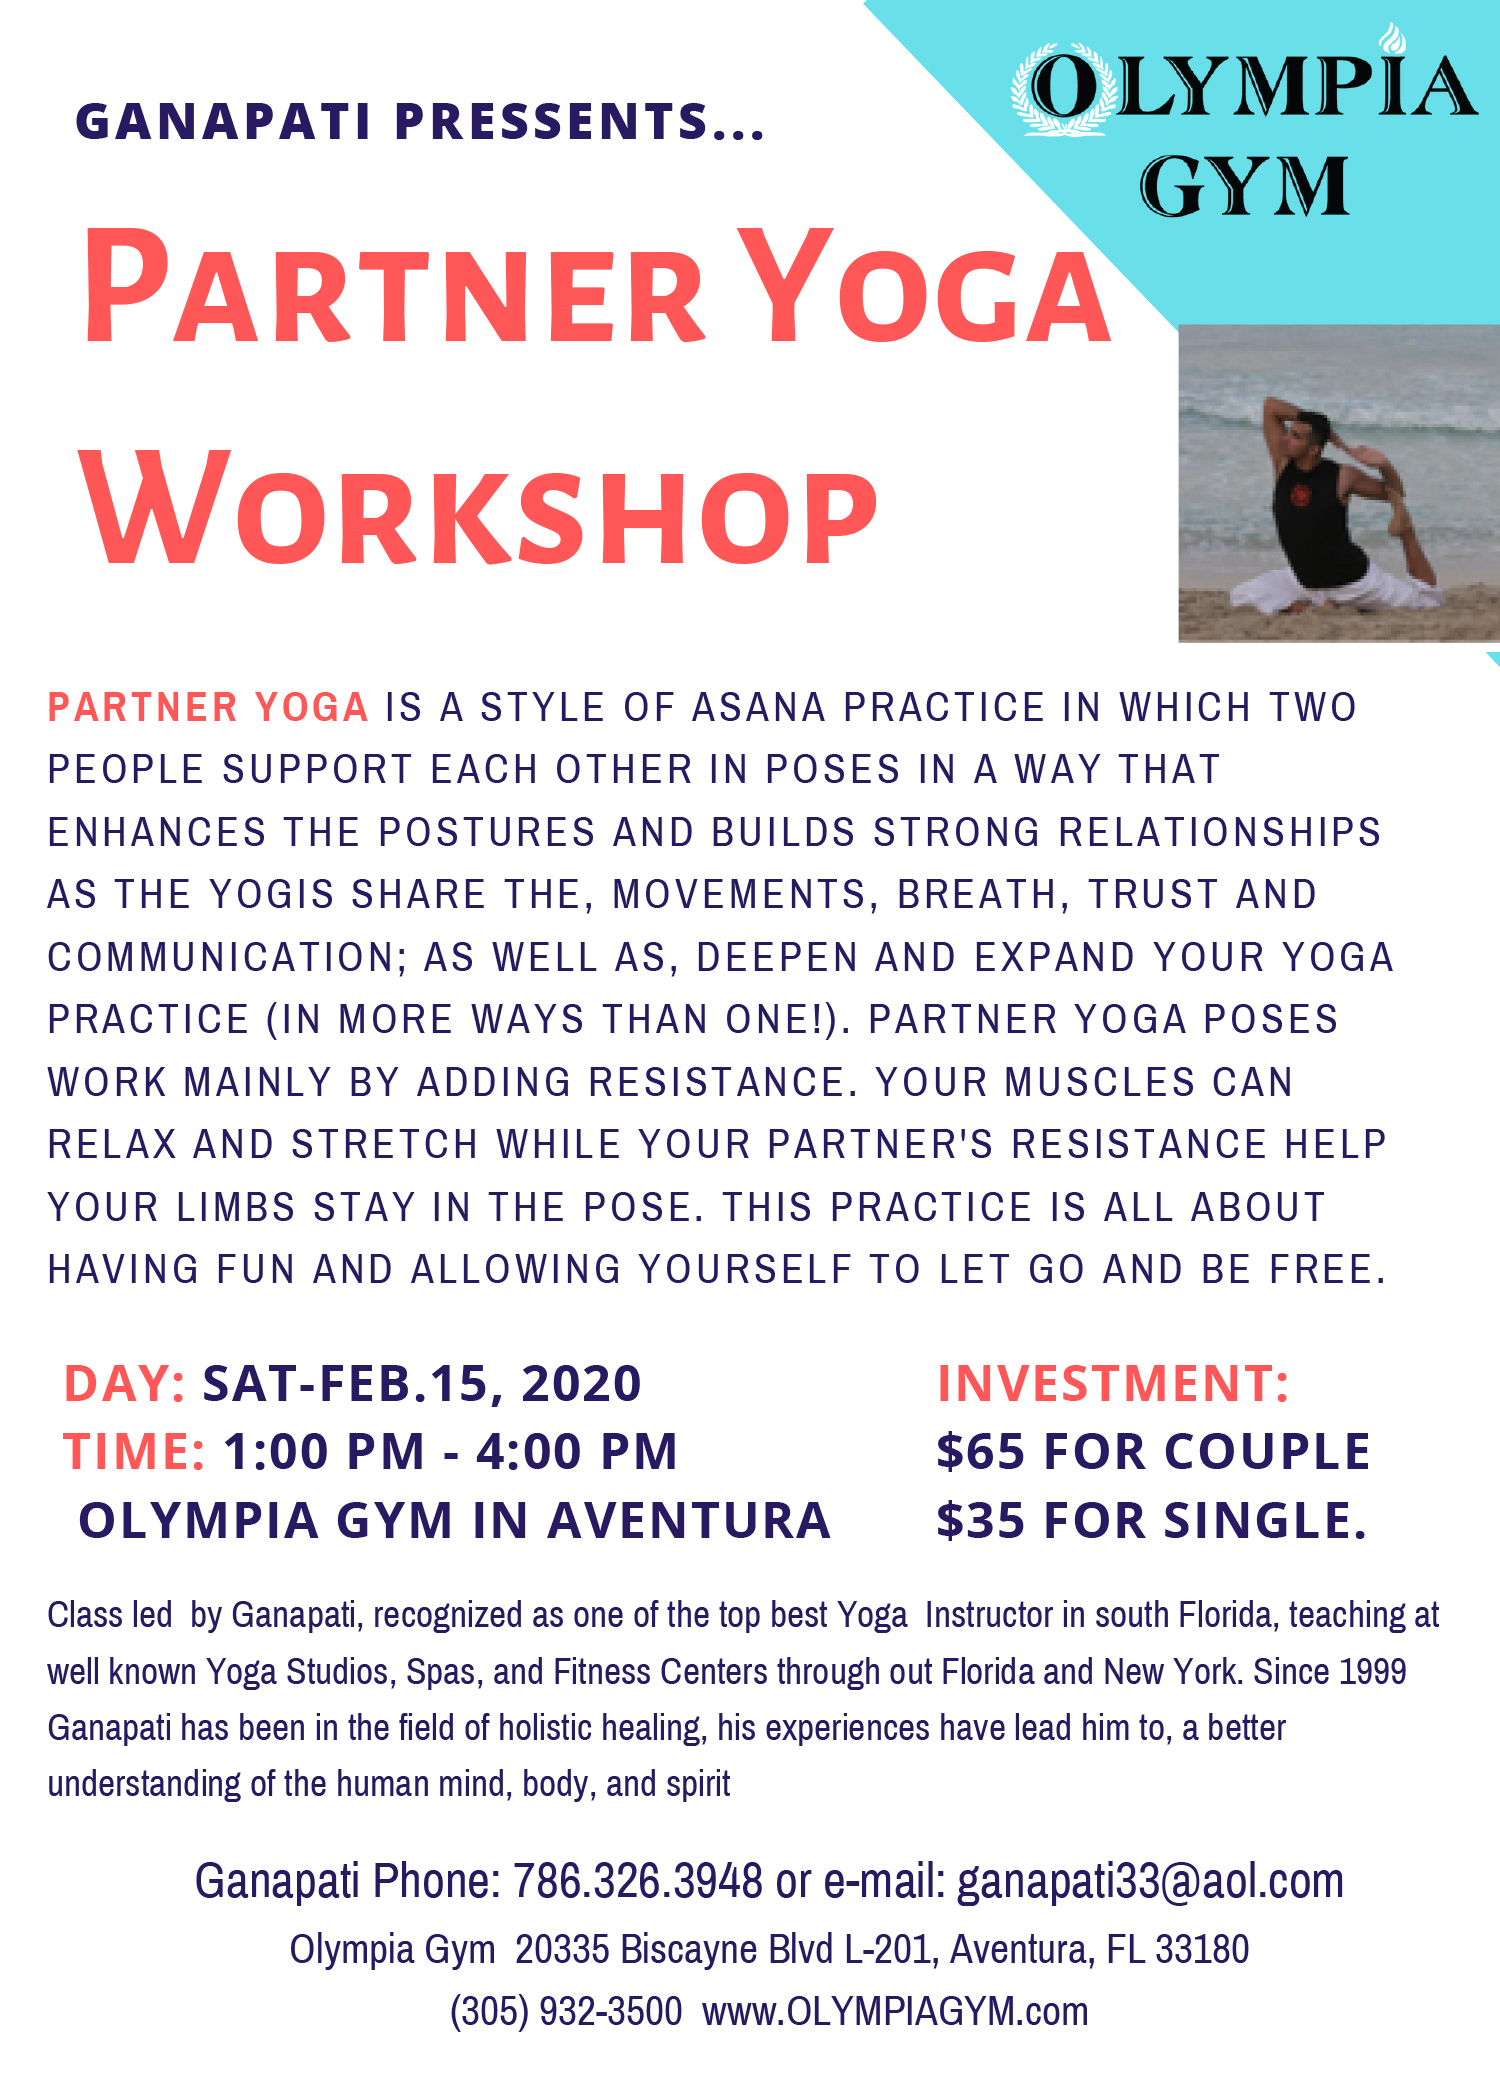 Couples Yoga Class - February 15th, 2020